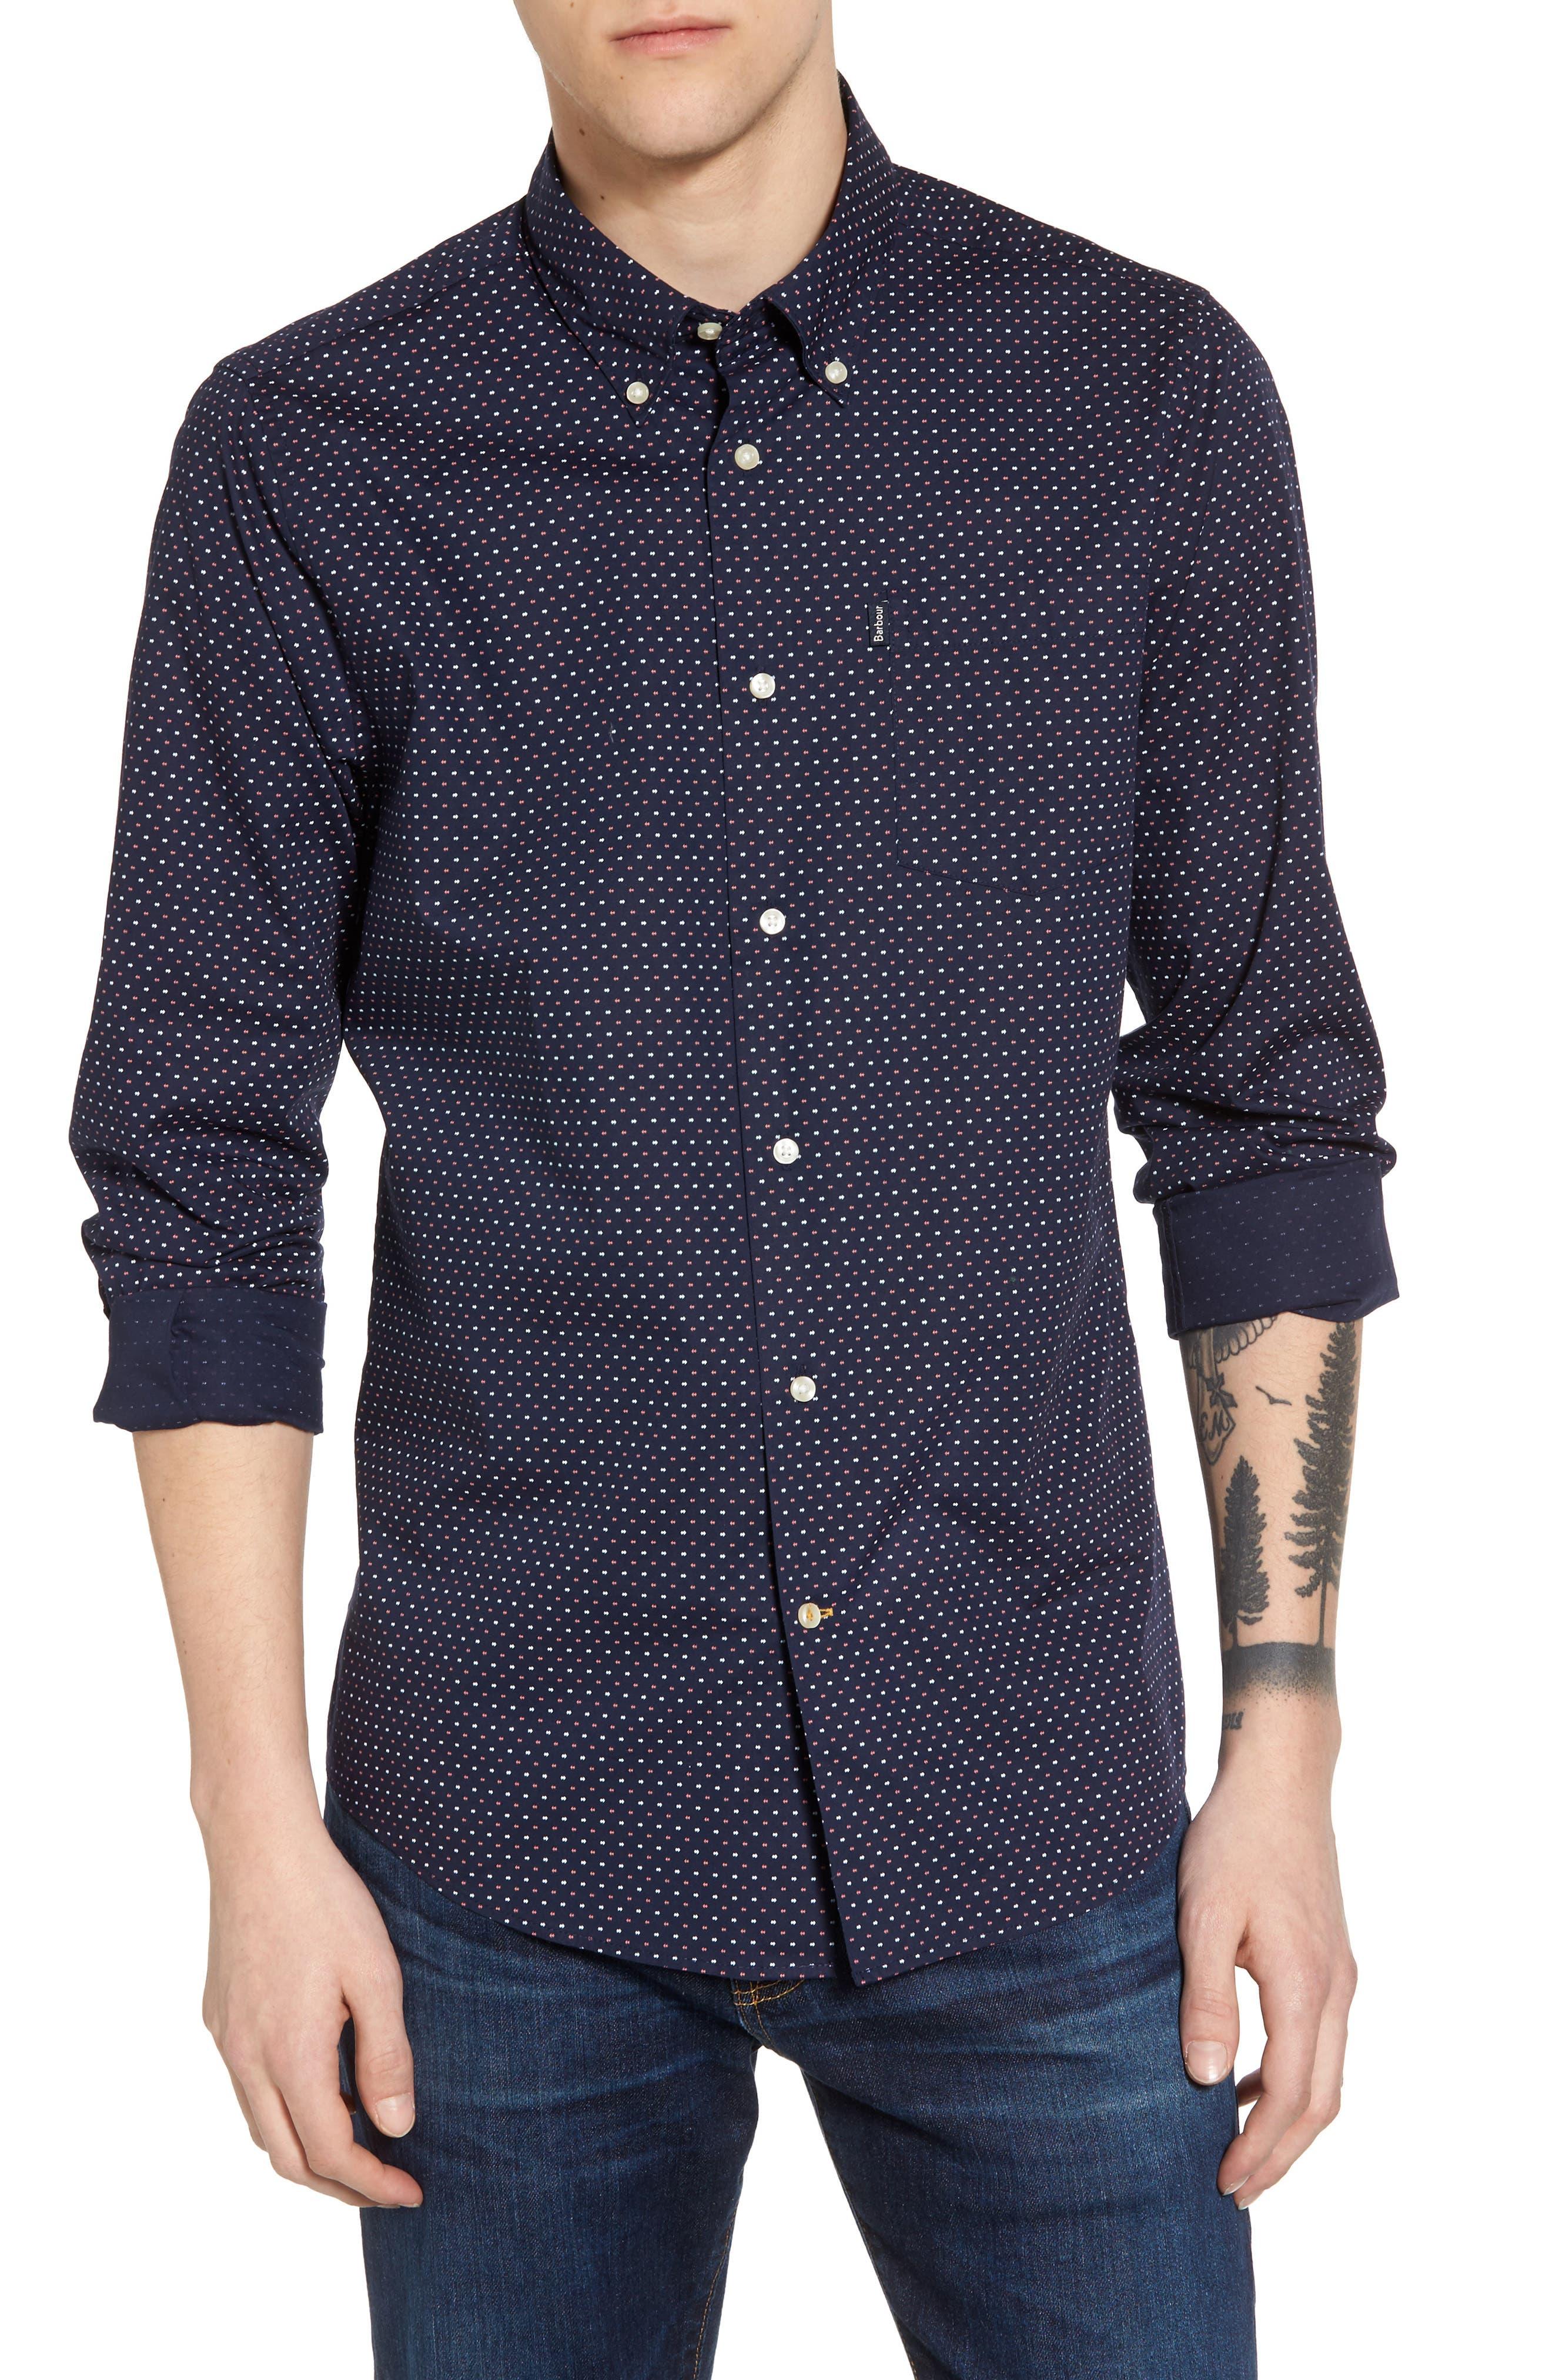 Cullen Trim Fit Print Sport Shirt,                         Main,                         color, Navy